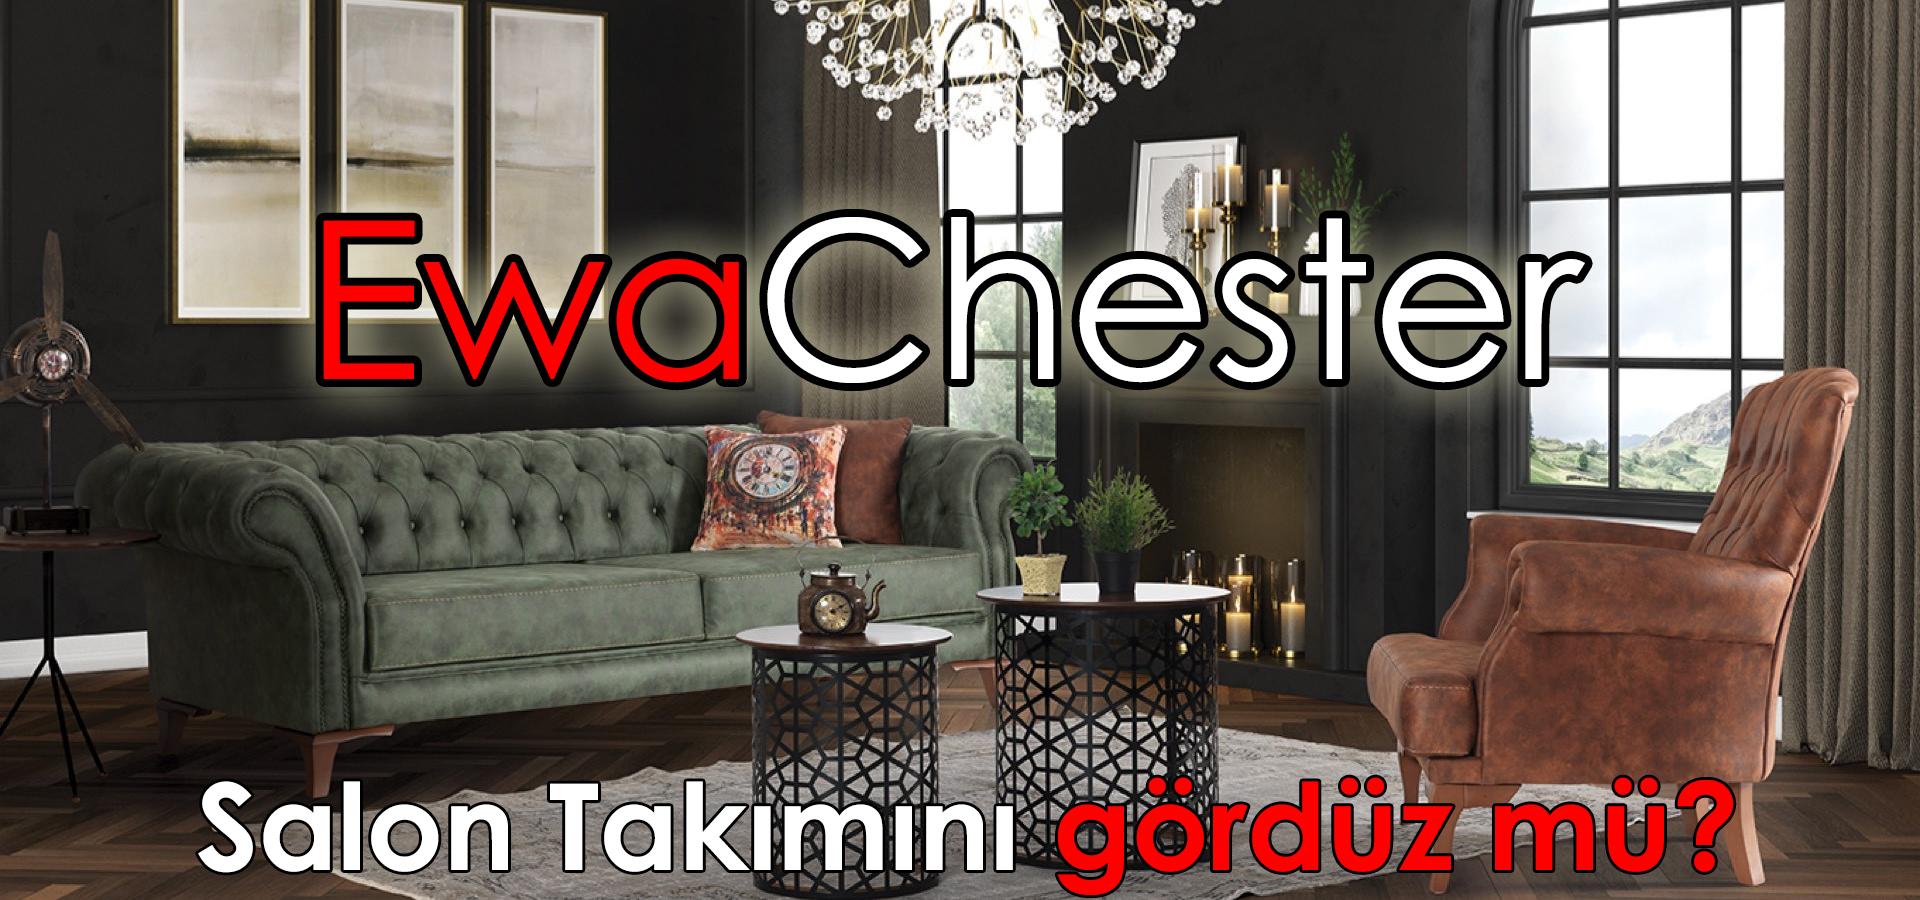 Ewa Chester Salon Takımı